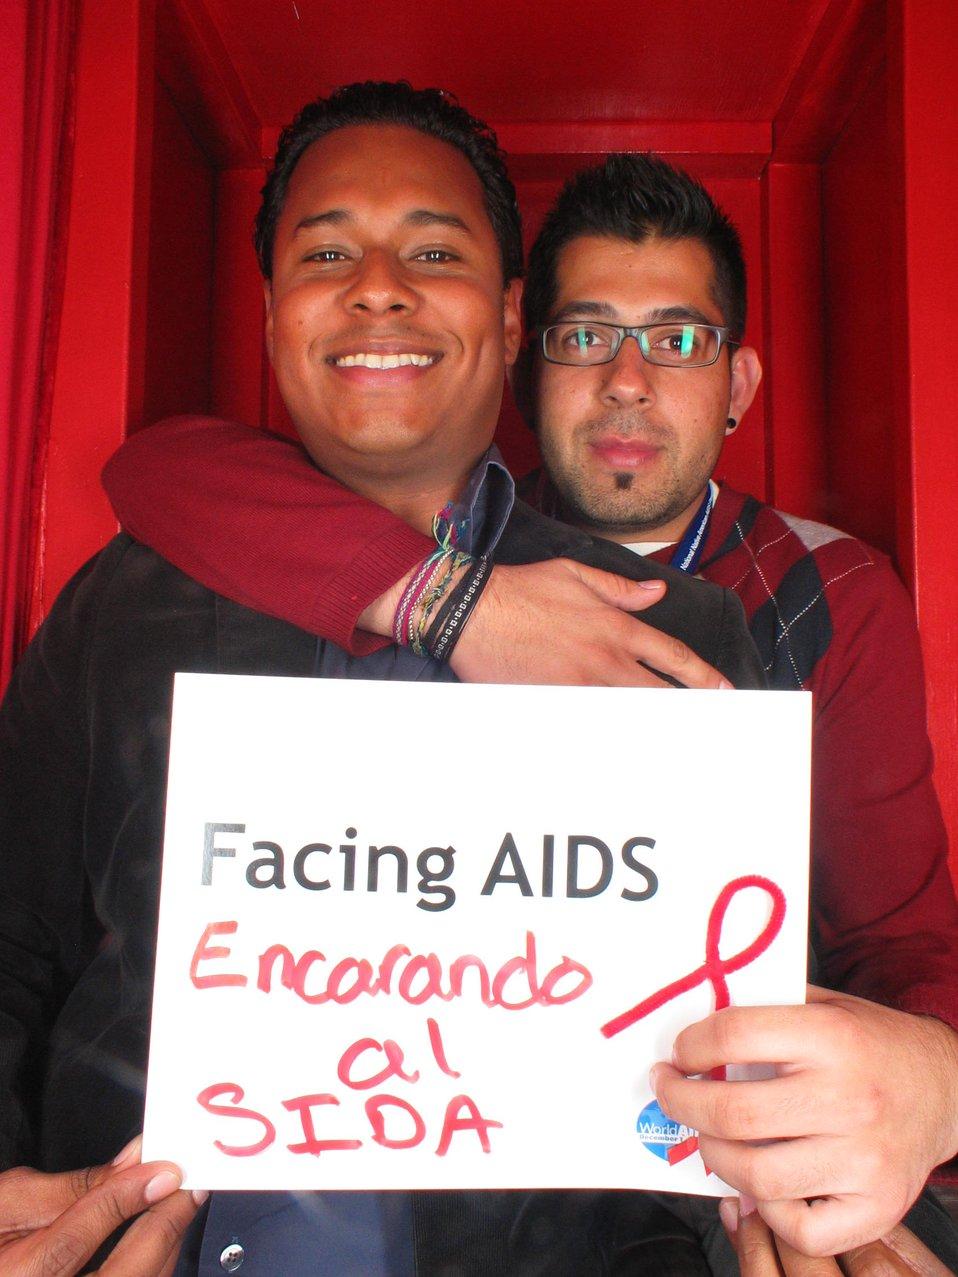 Facing AIDS encarando al SIDA.